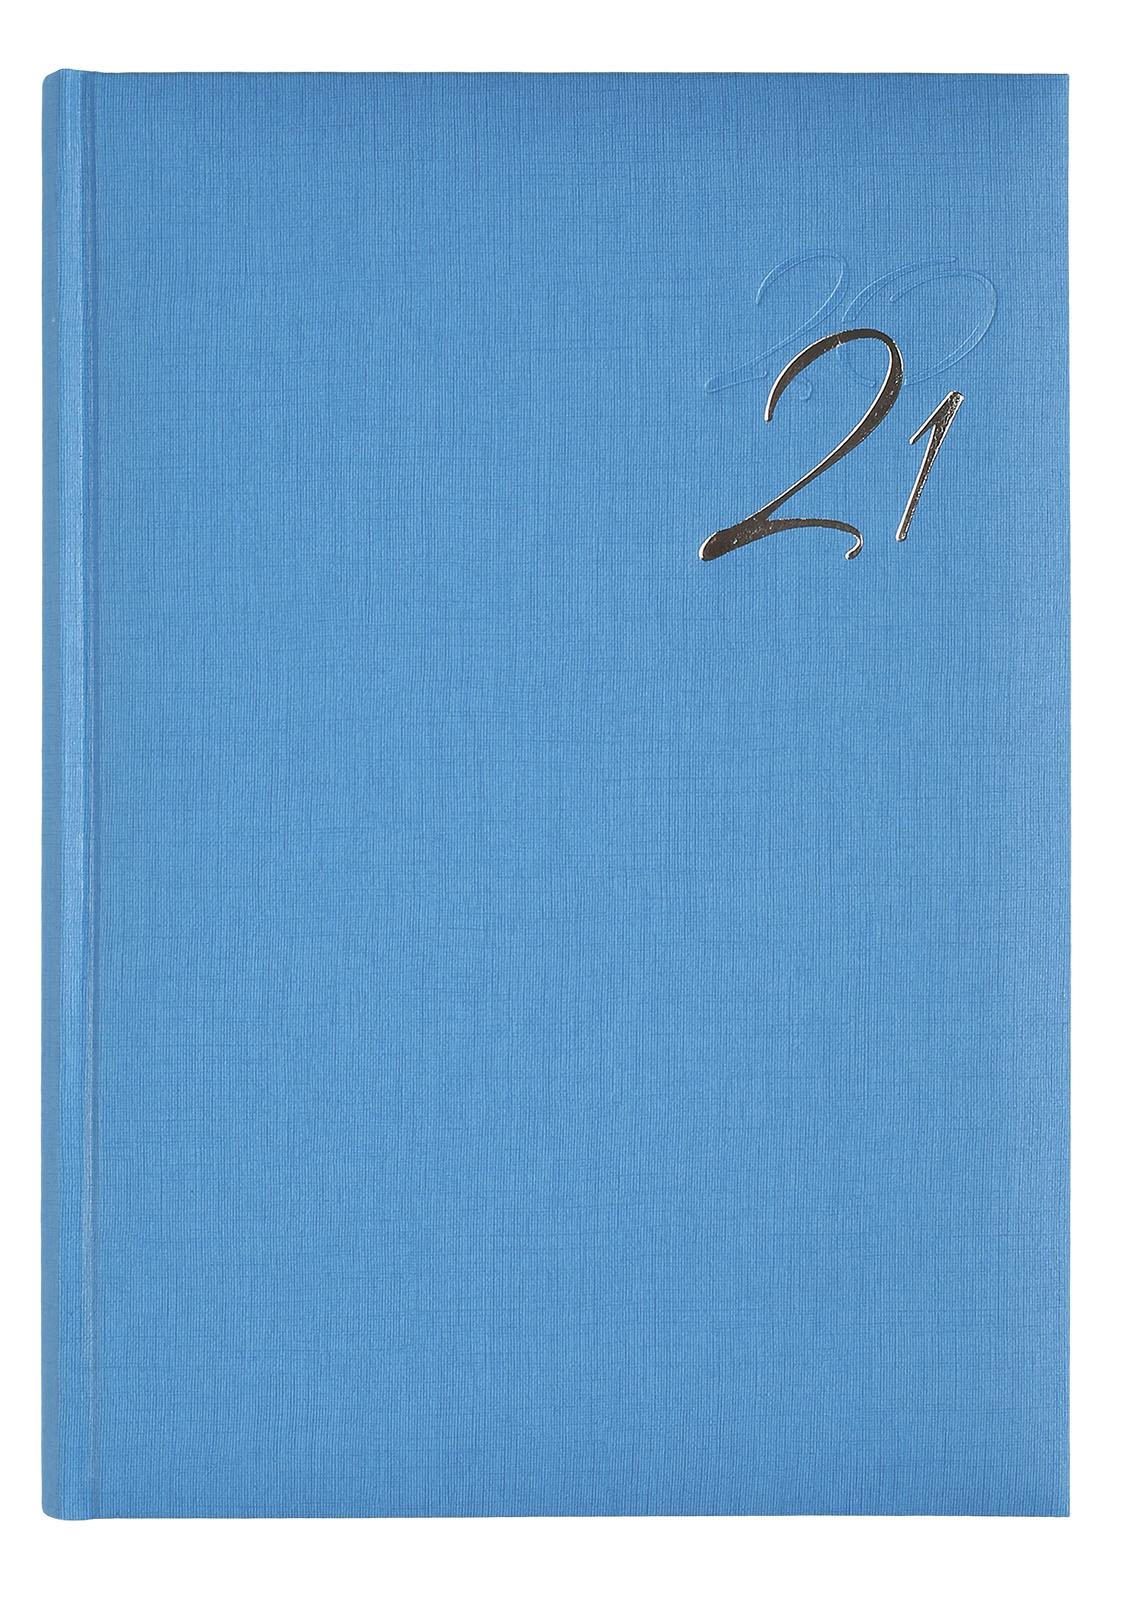 E11-Agenda Dia / 68-Caribe / 812-Azul